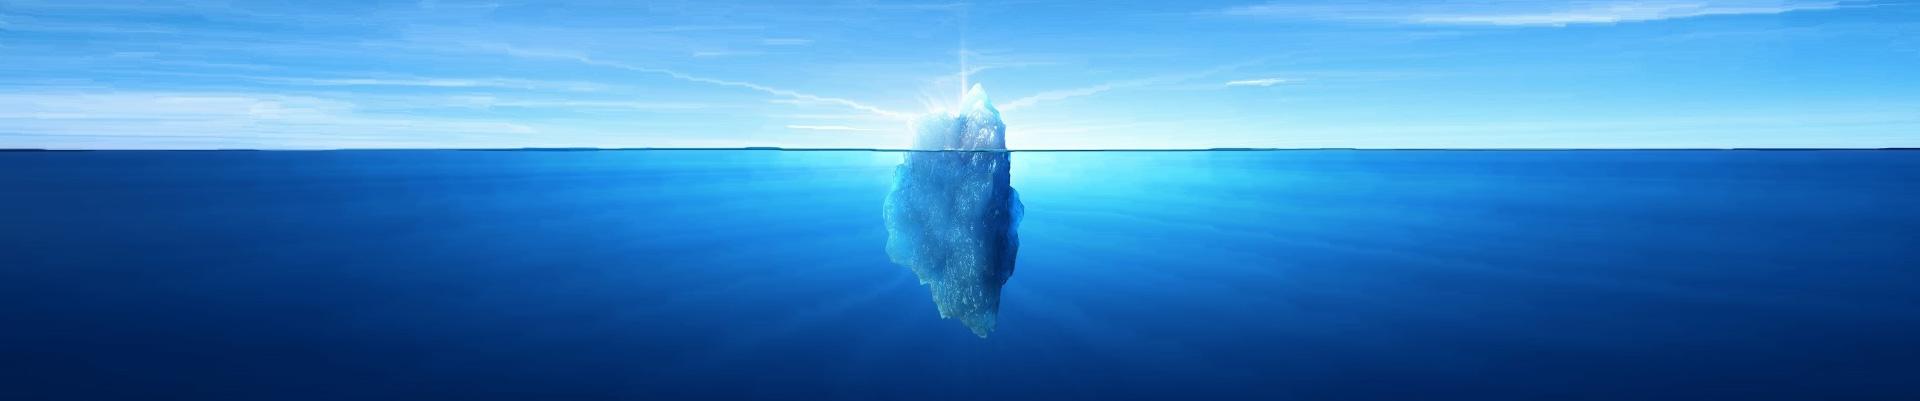 iceberg_homepage